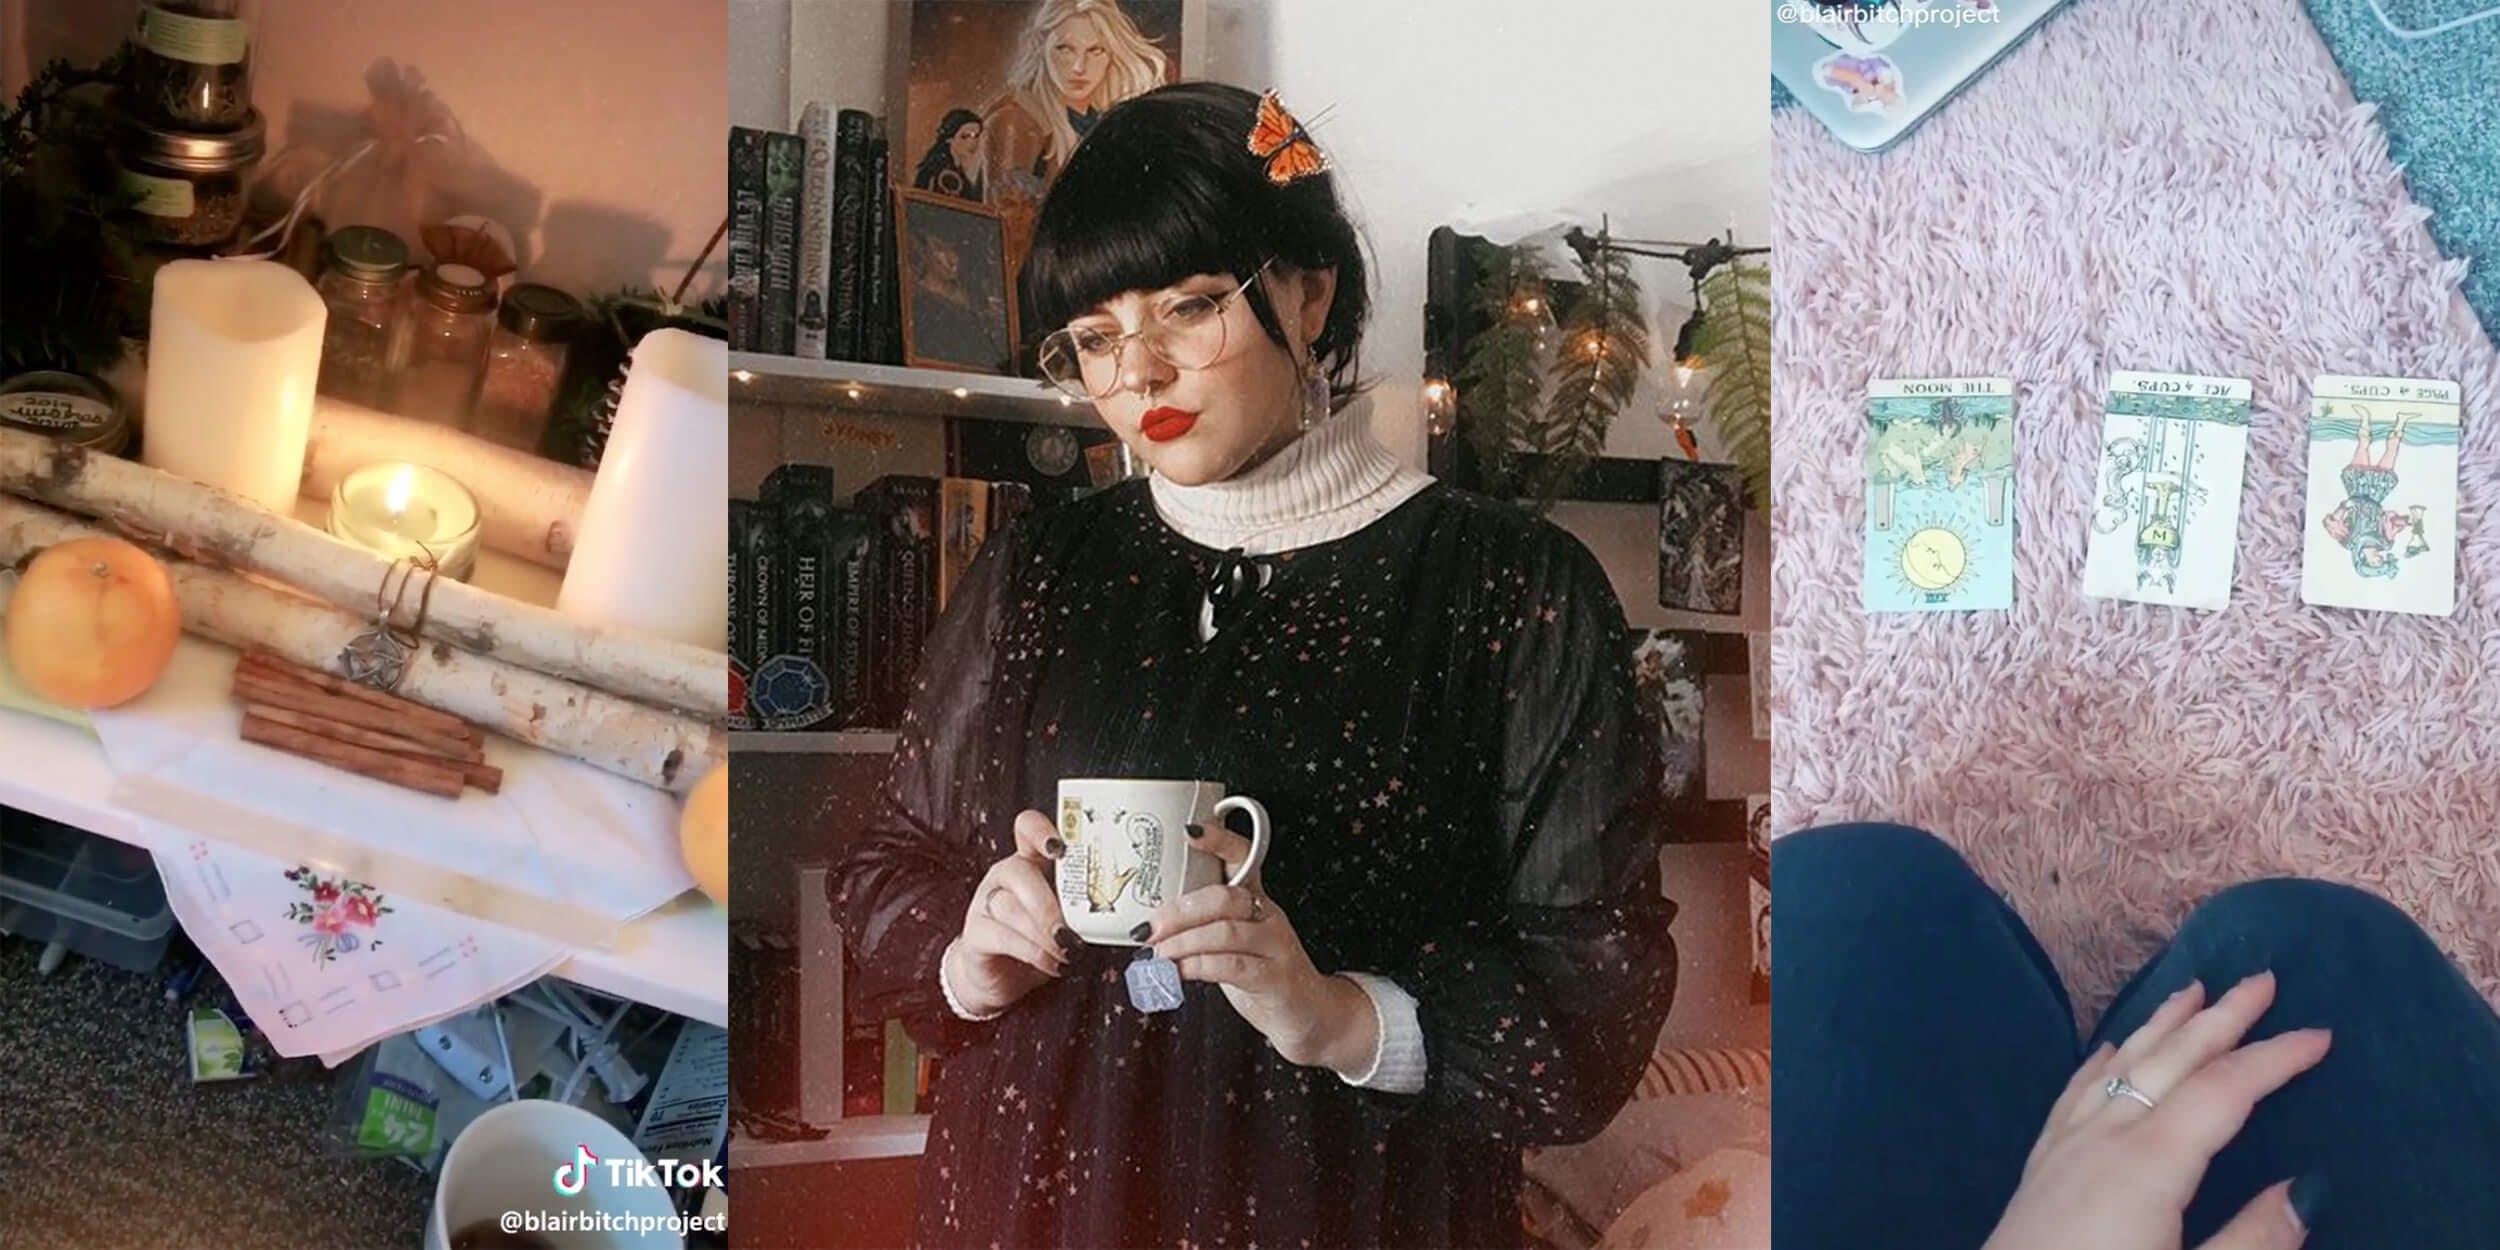 tiktok witches blairbitchproject